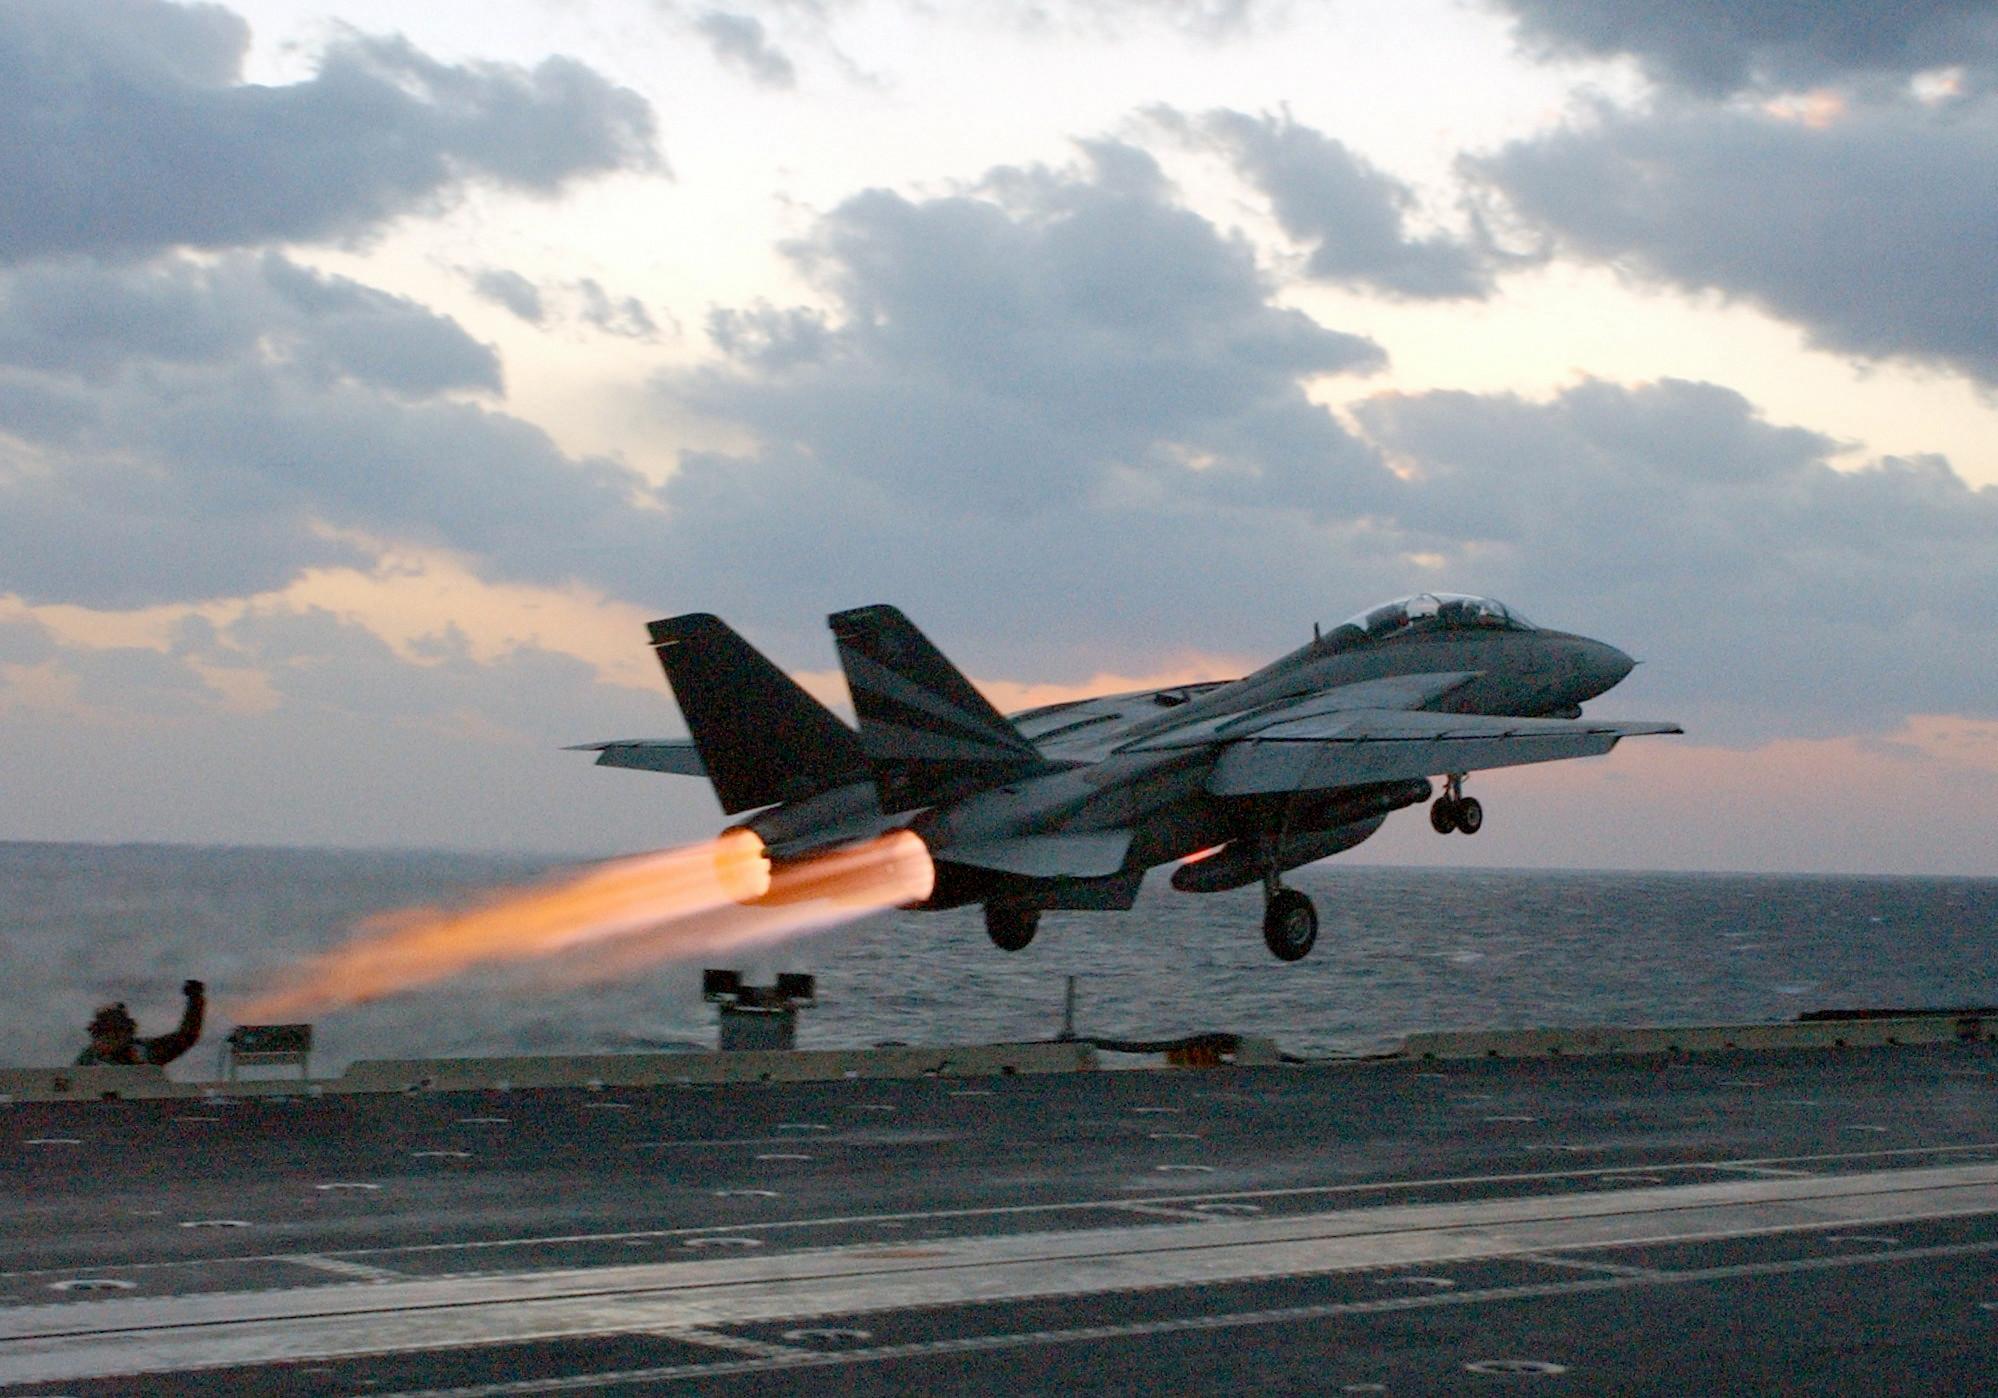 Res: 1998x1398, Militär - Grumman F-14 Tomcat Wallpaper